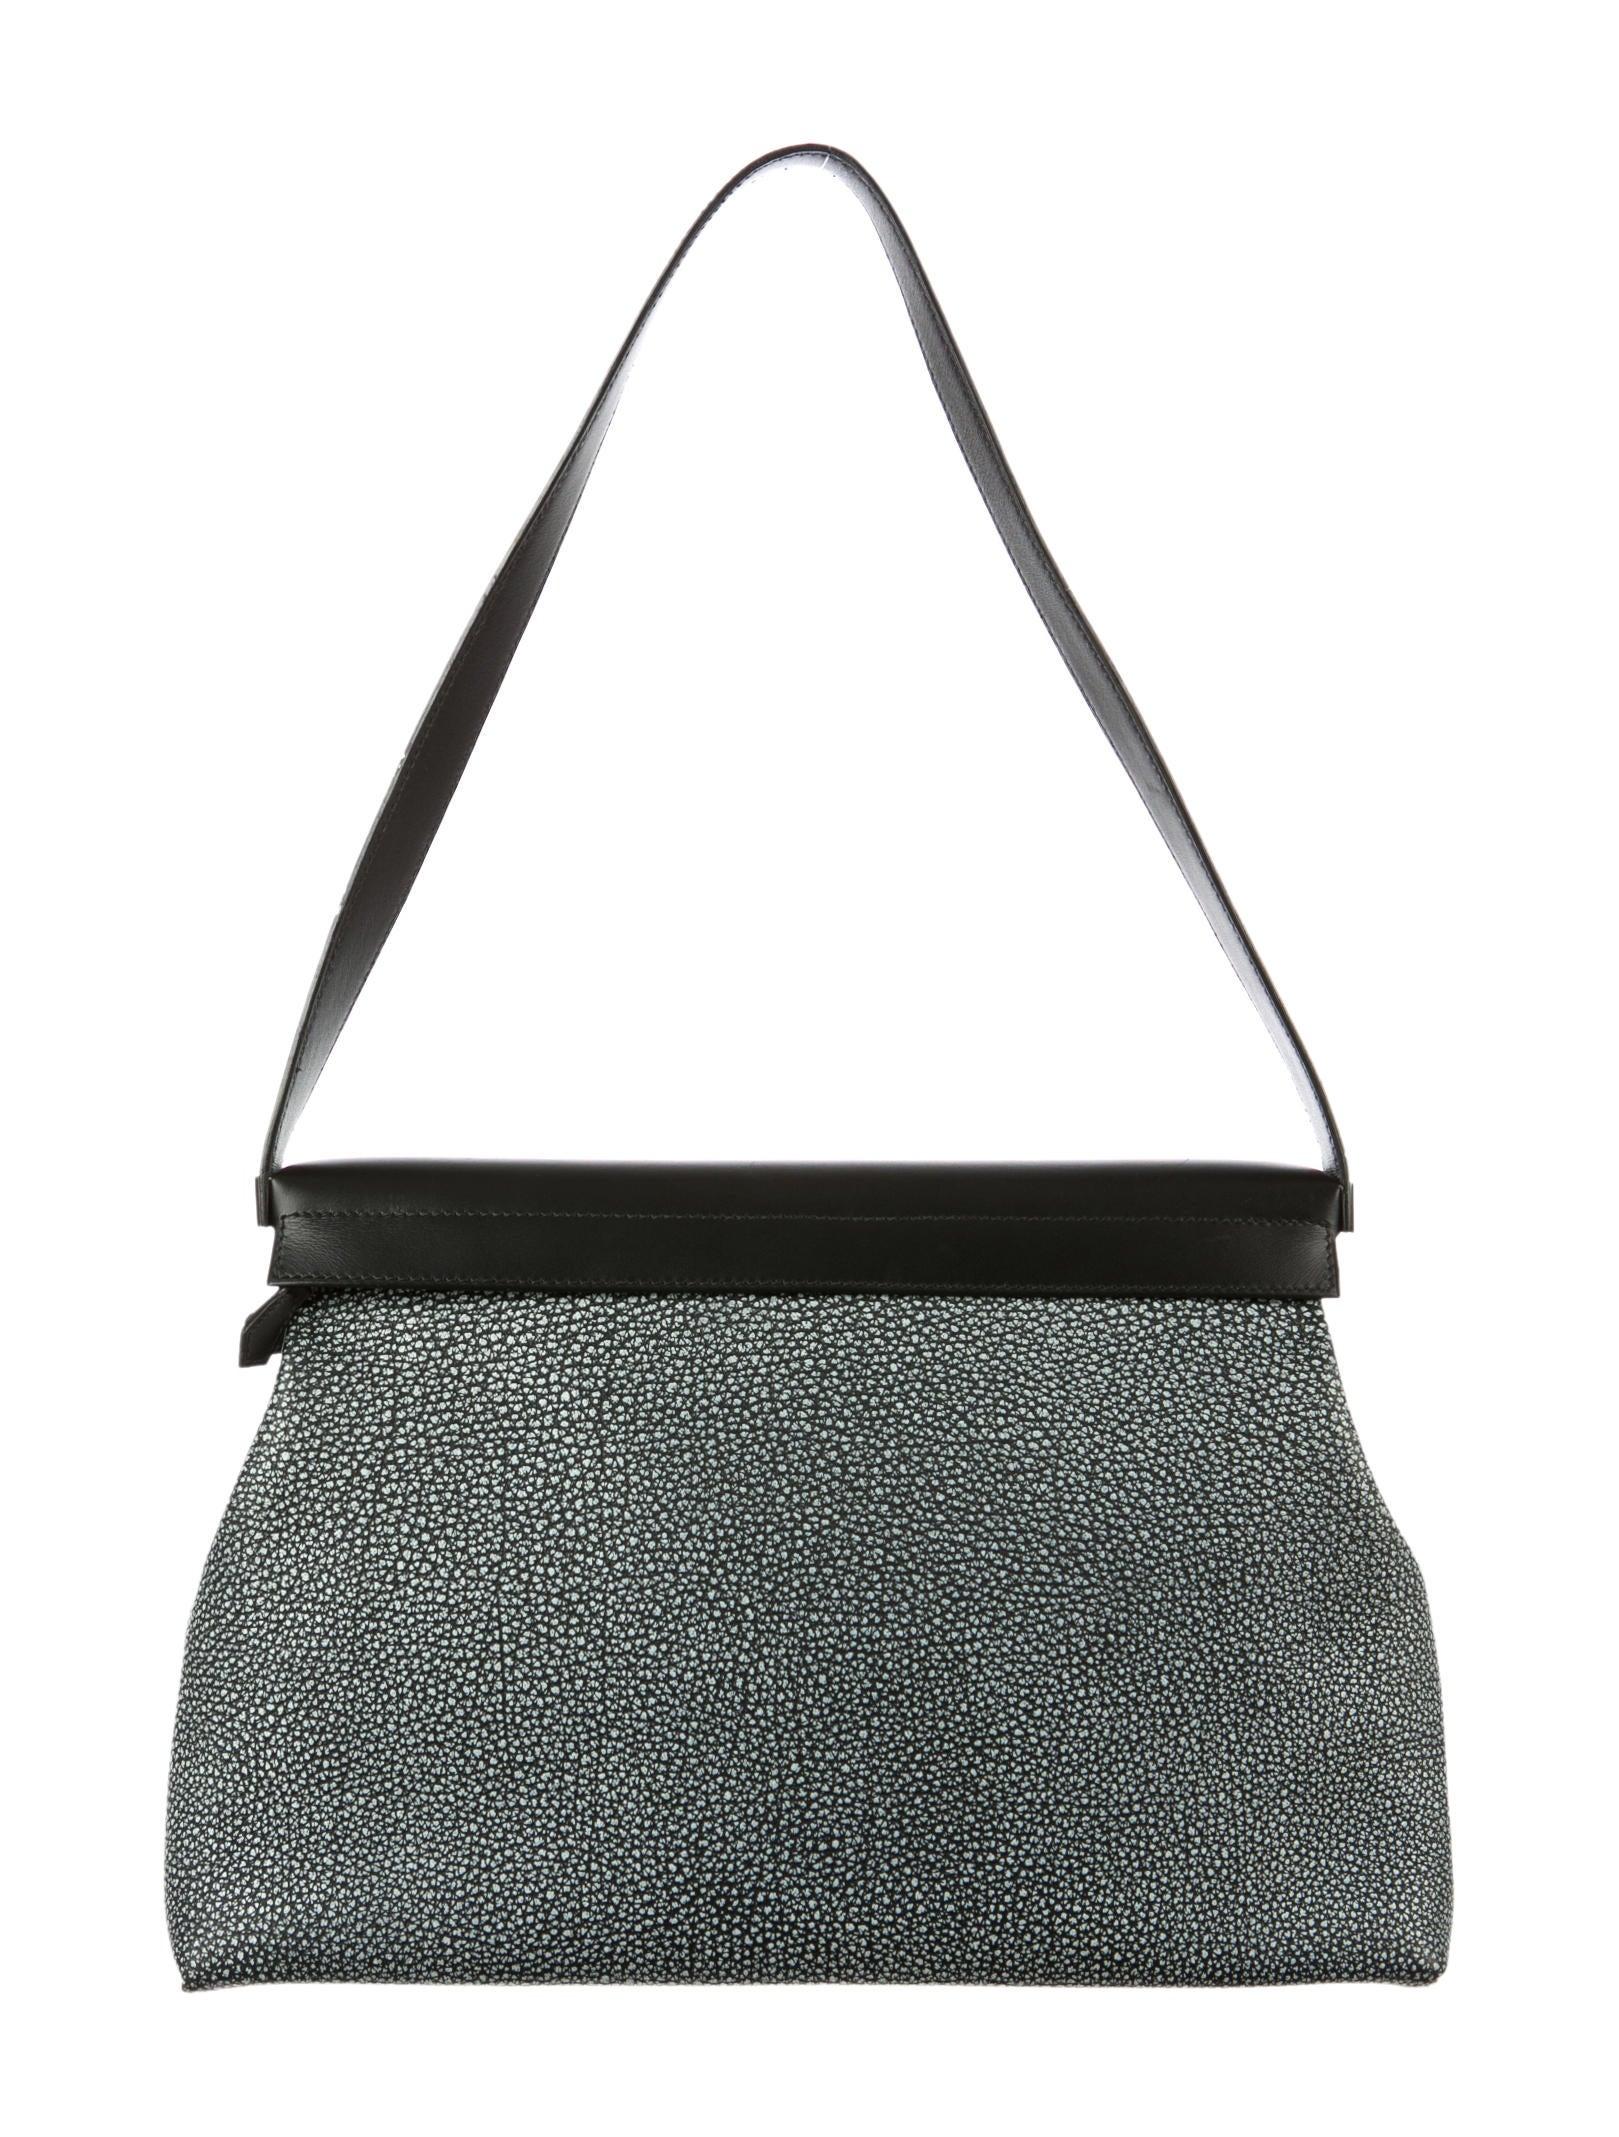 58b8d82e21b0 Hermès Dalmatian Yeoh Bag - Handbags - HER28832